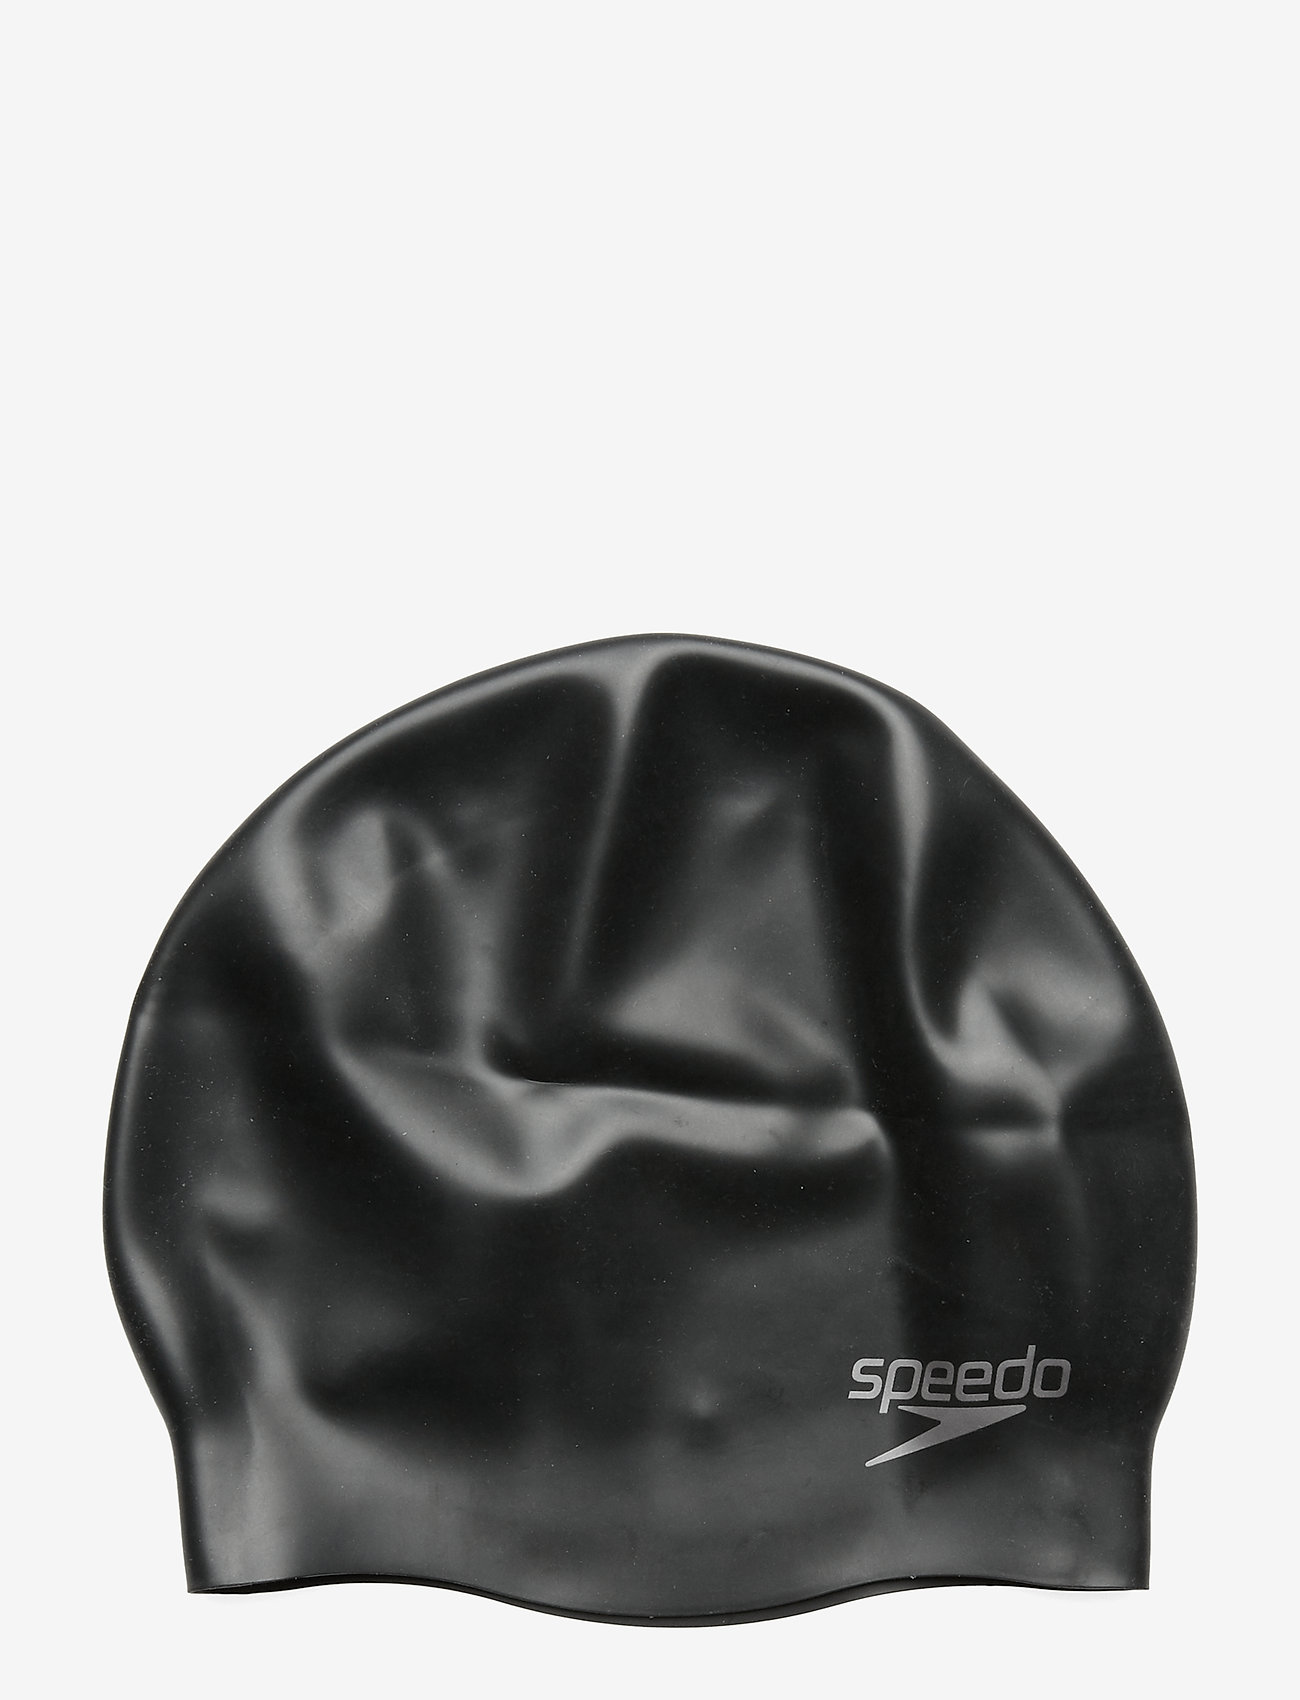 Speedo - SPEEDO SILICON MOULDED CAP AU, WHI MOP - overige accessoires - black - 1